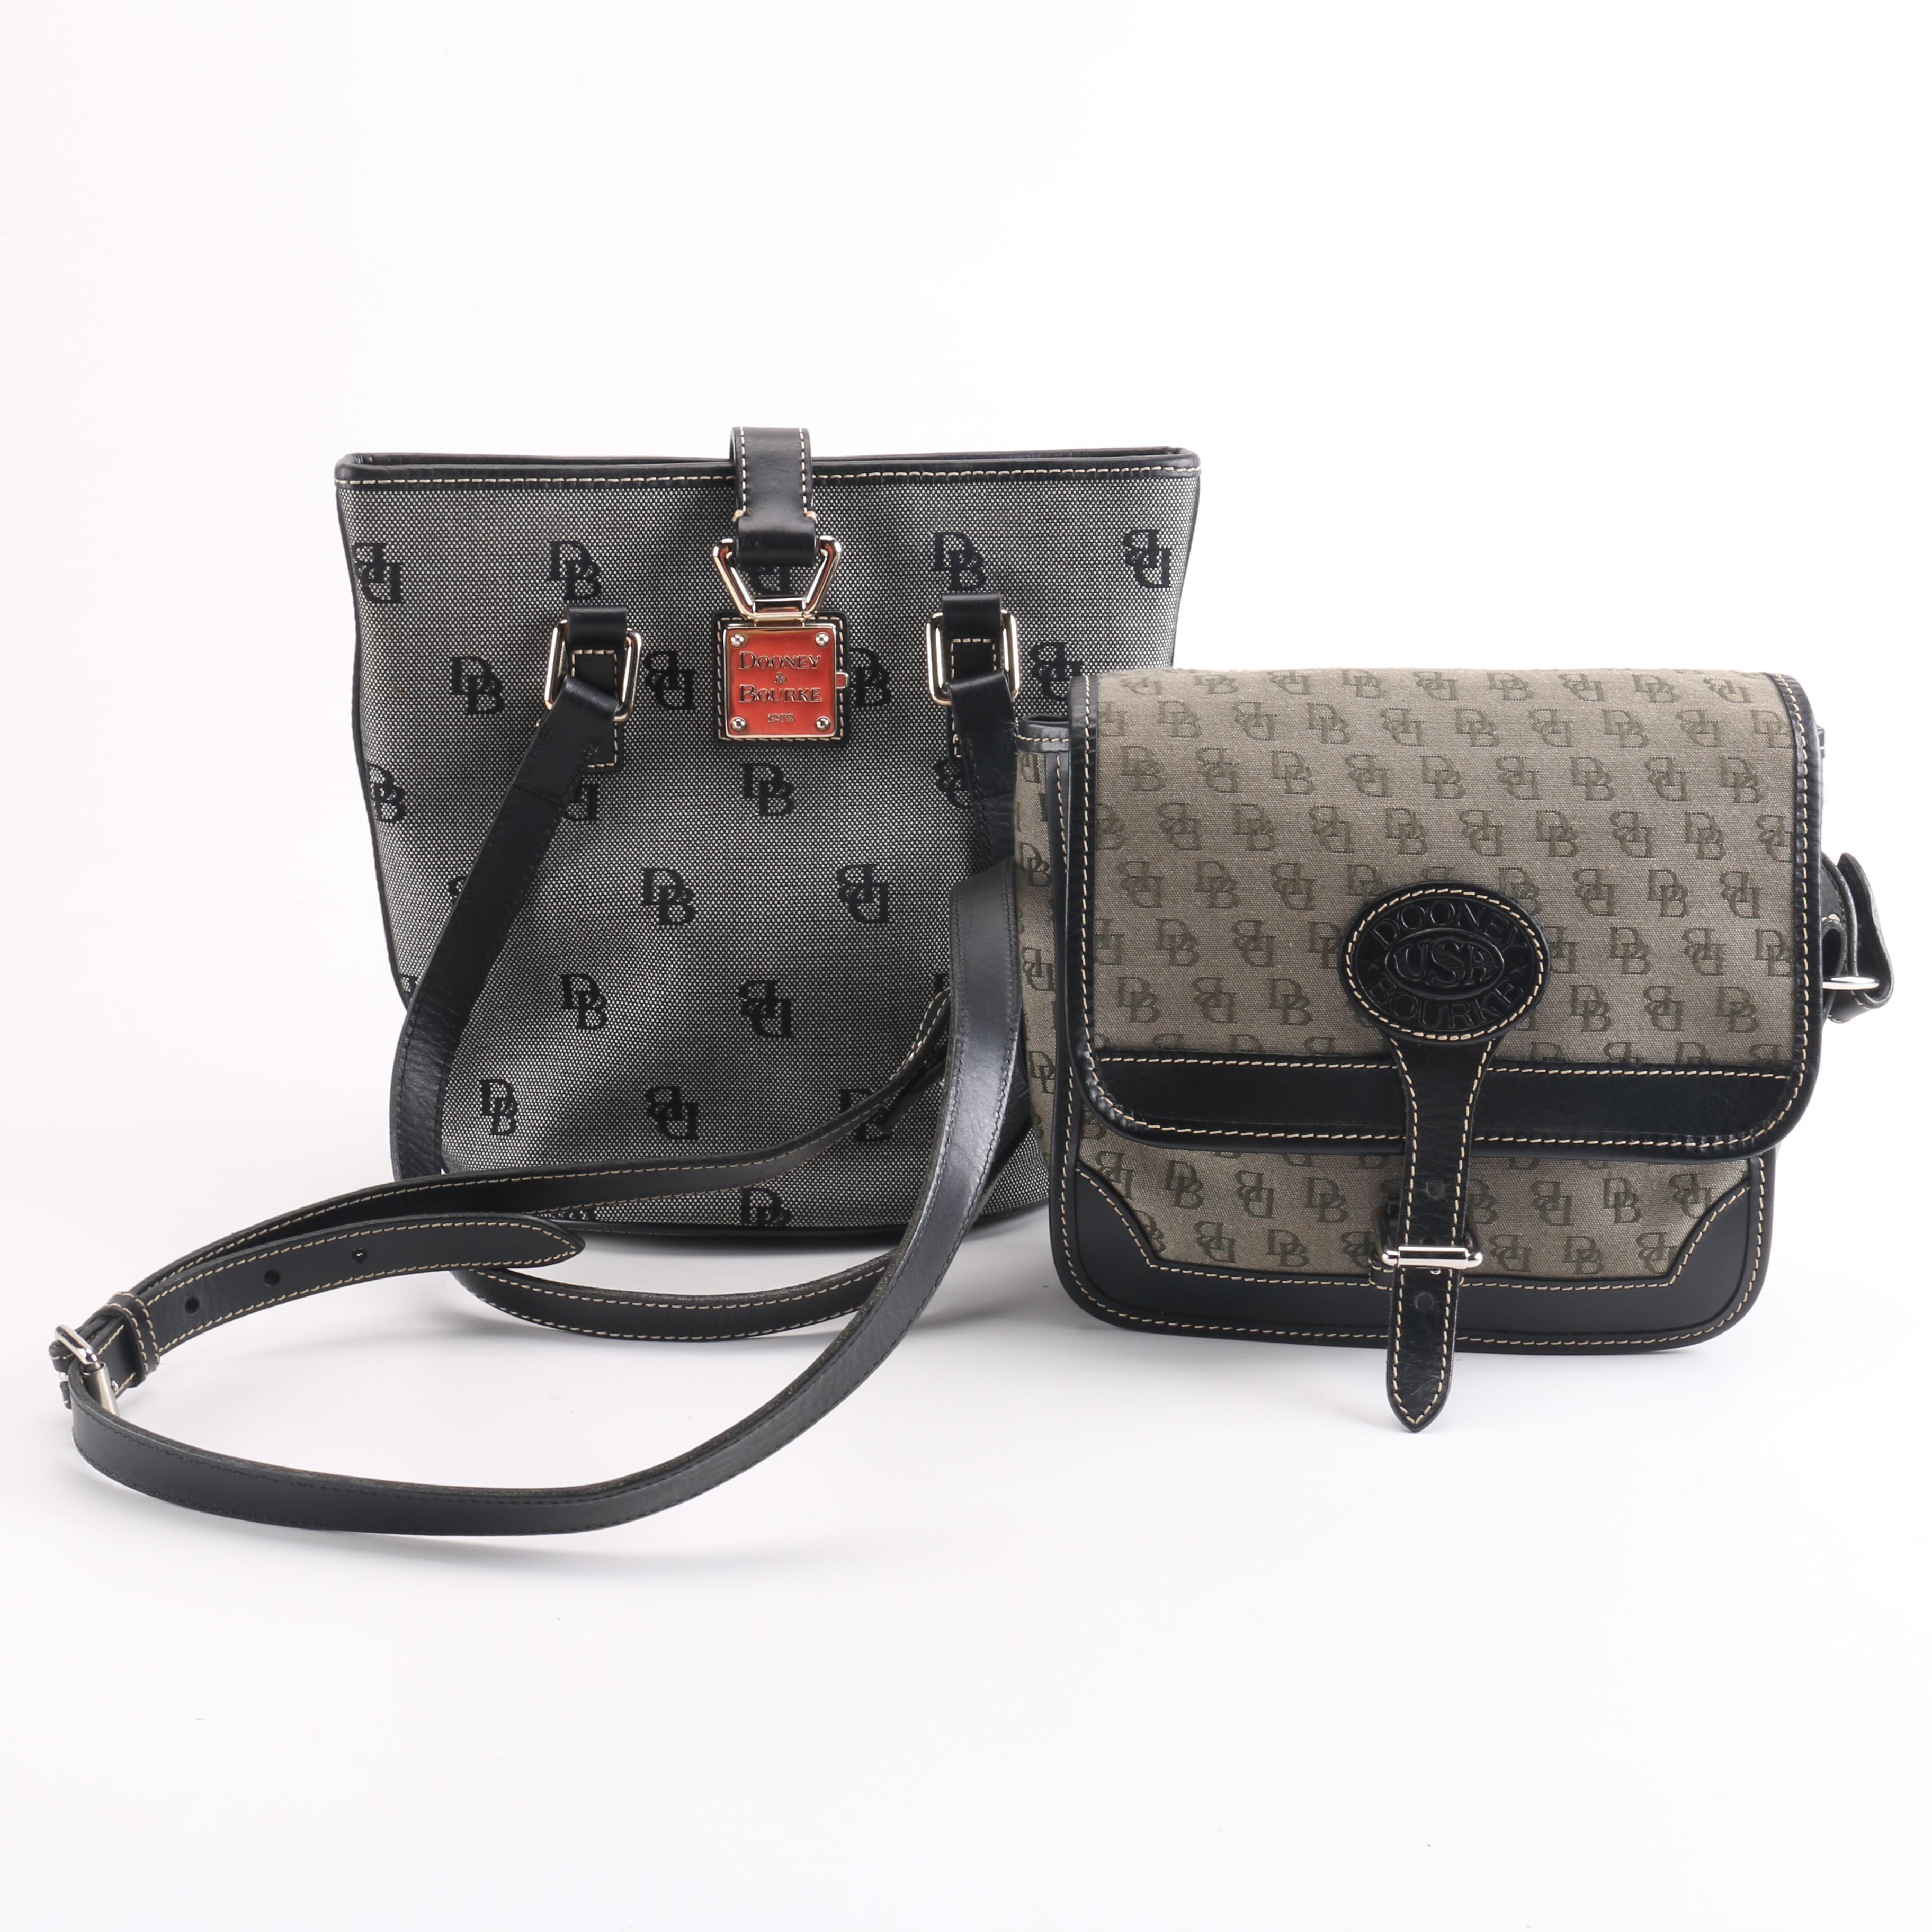 Dooney & Bourke Signature Jacquard and Black Leather Handbags